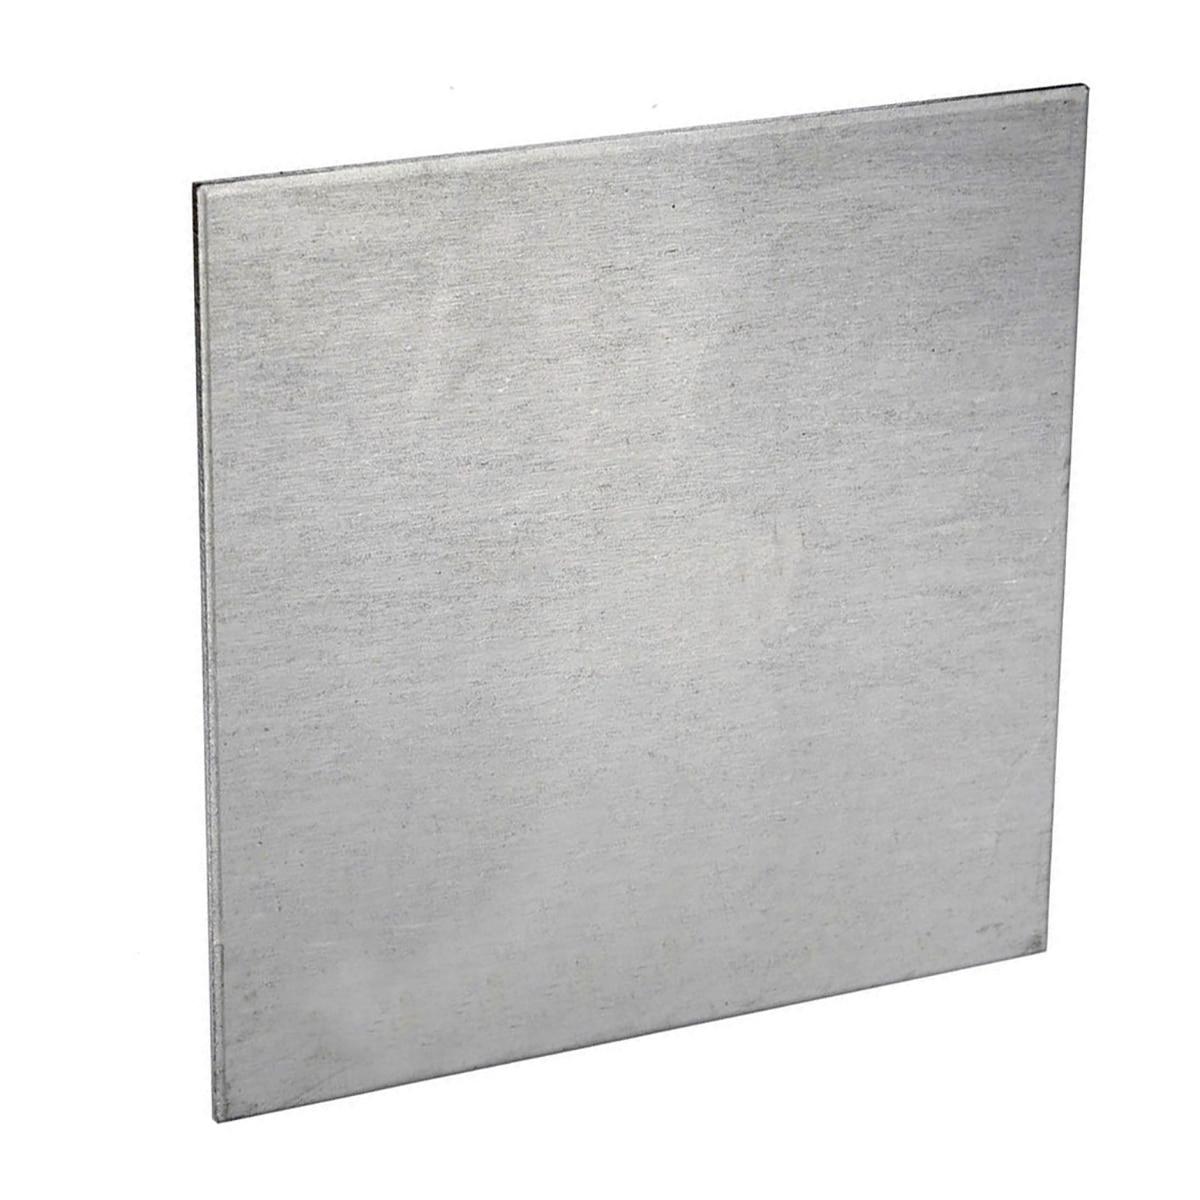 1 ud. Placa de titanio de 0,5mm 0,8mm 1mm 2mm 3mm 4mm de espesor hoja de titanio Ti grado Gr2 ASTM B265 100x100mm con alta dureza